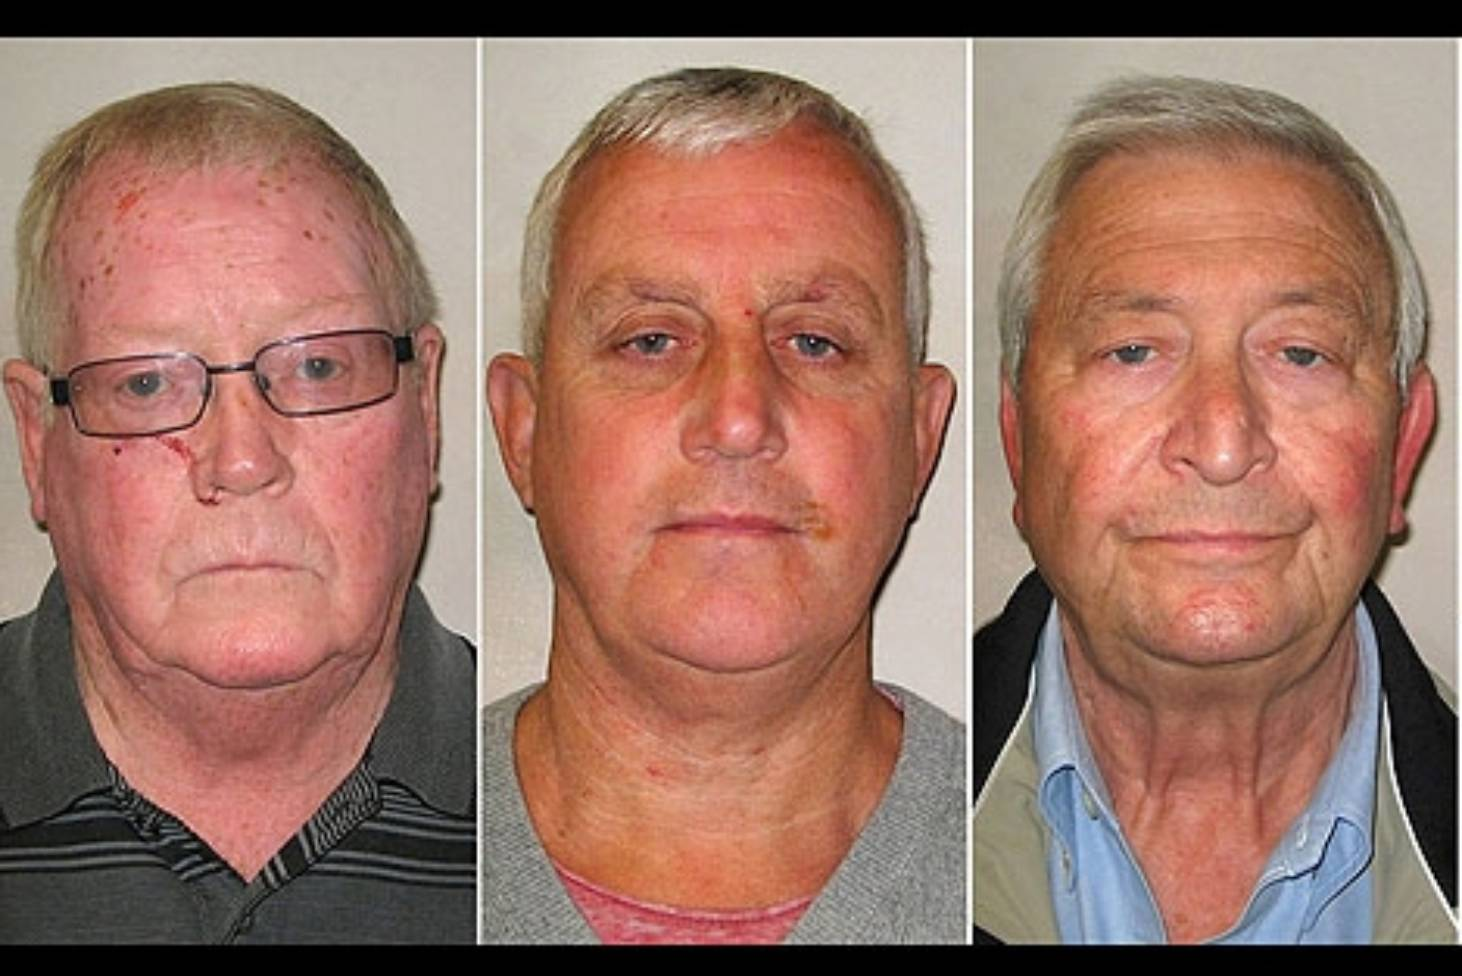 Hatton Garden Jewel Heist Pensioners Plead Guilty Over Multi